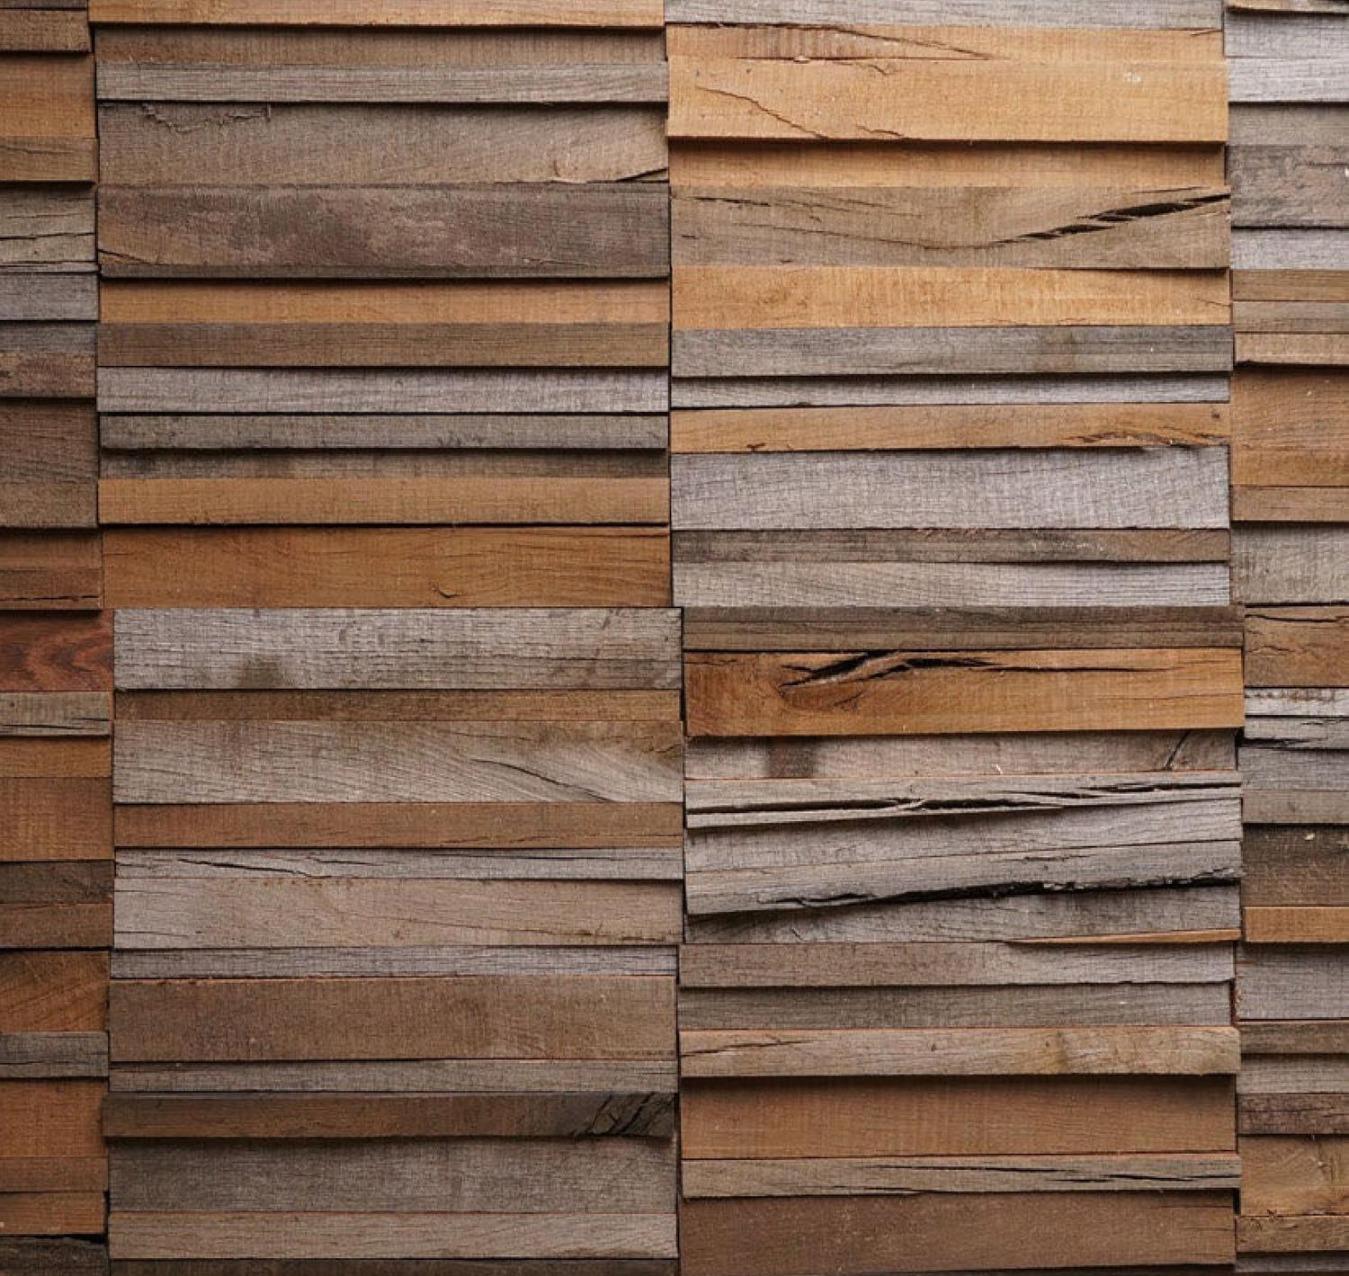 3d wood wall panels pannelli per pareti 3d in legno - Pannelli decorativi legno ...